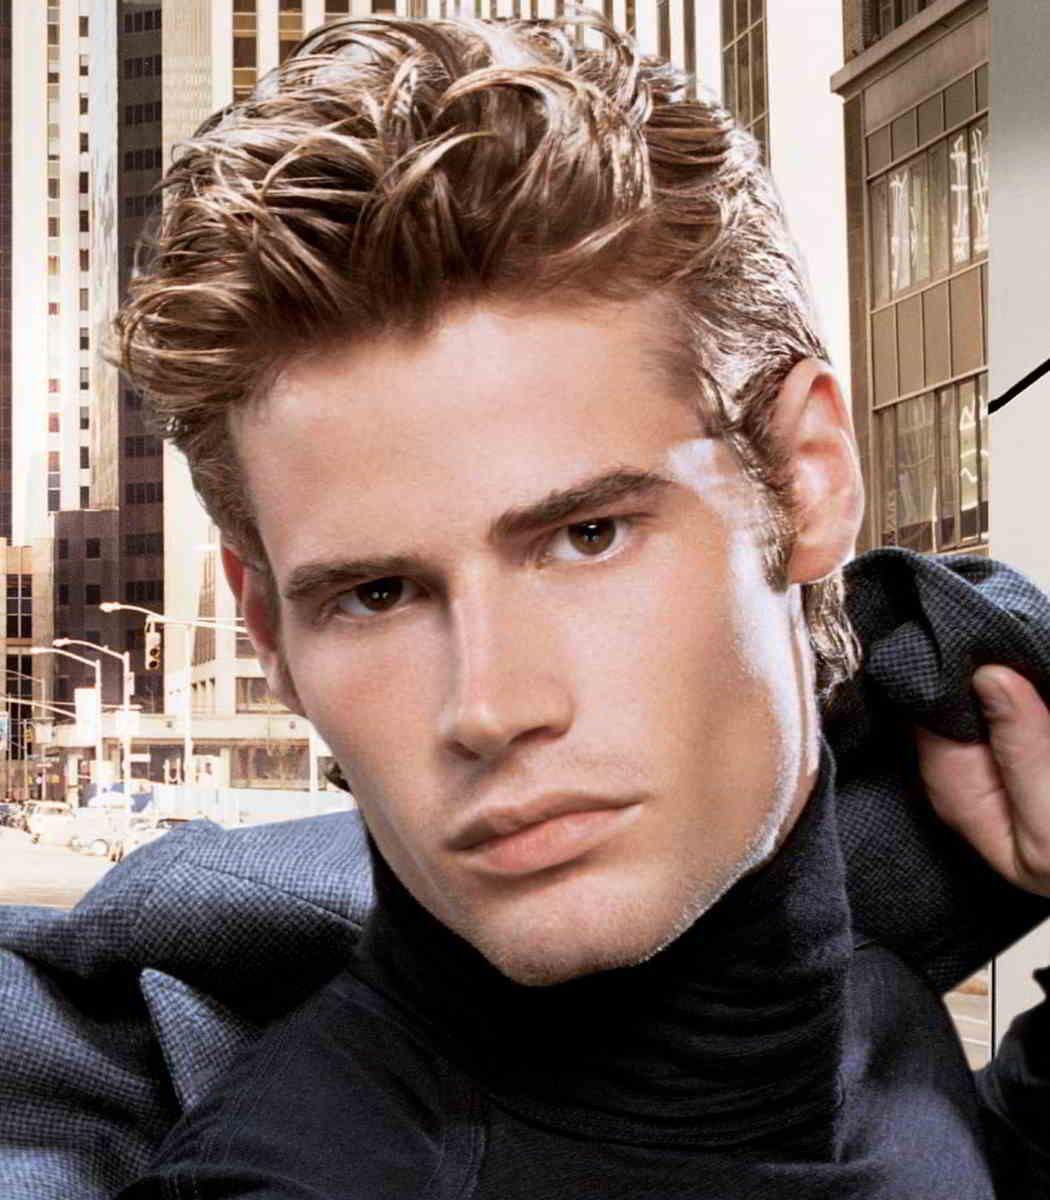 Trendy haircuts for men rockabilly hairstyles  men hair style  pinterest  haircuts men